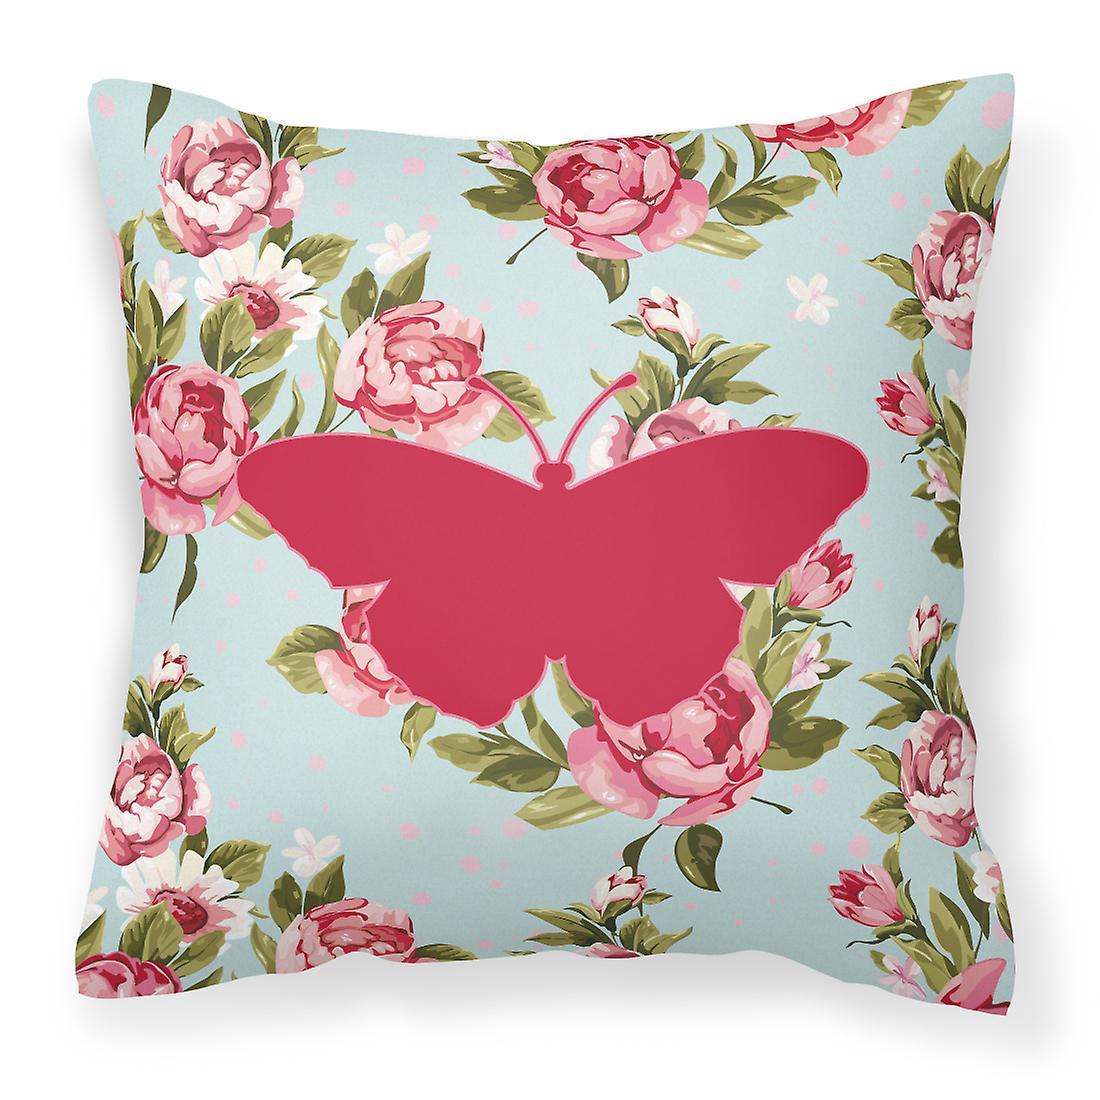 Tissu Toile Roses Papillons Bb1050 Chic Oreiller Bleu Décoratif Minable f7bgvY6y